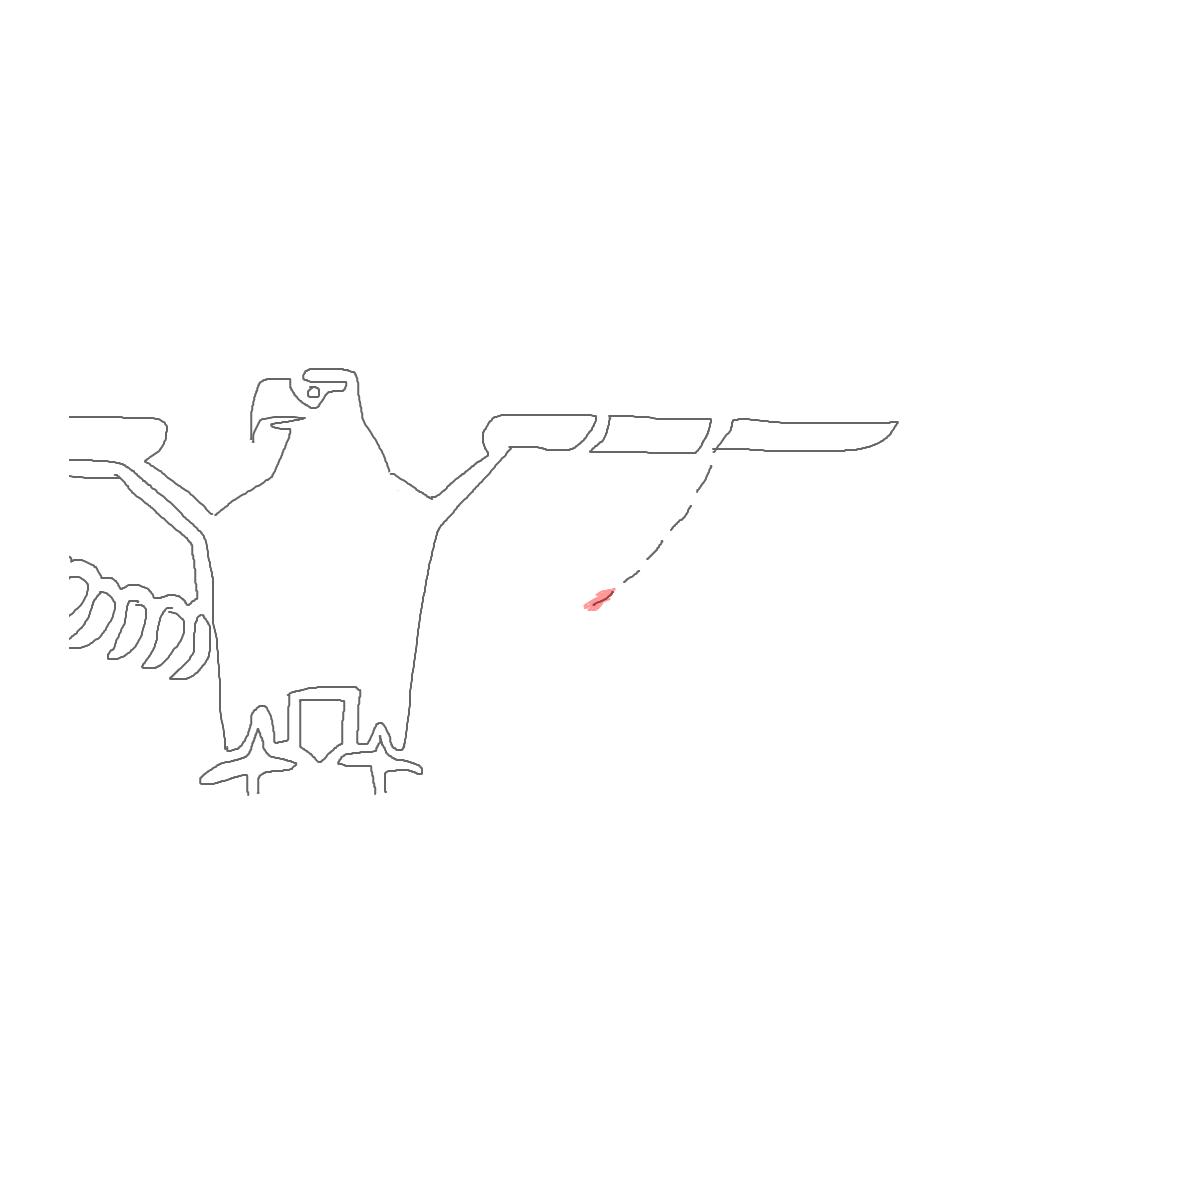 BAAAM drawing#19135 lat:60.3900756835937500lng: 25.6671104431152340